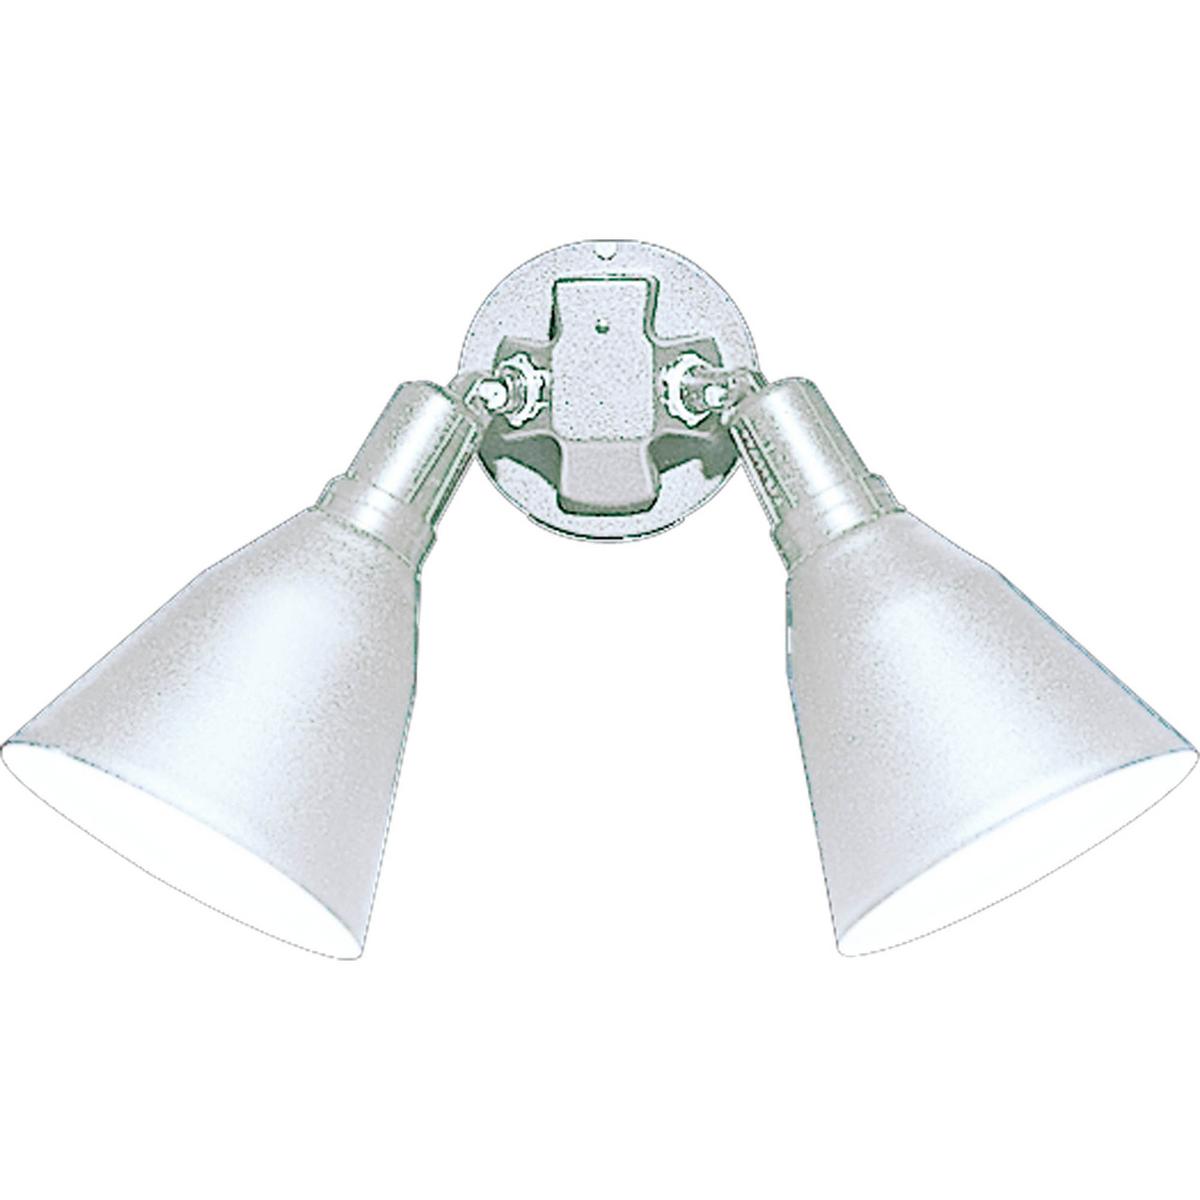 PRO P5203-30 Two Light White Outdoor Flood Light 2X150M